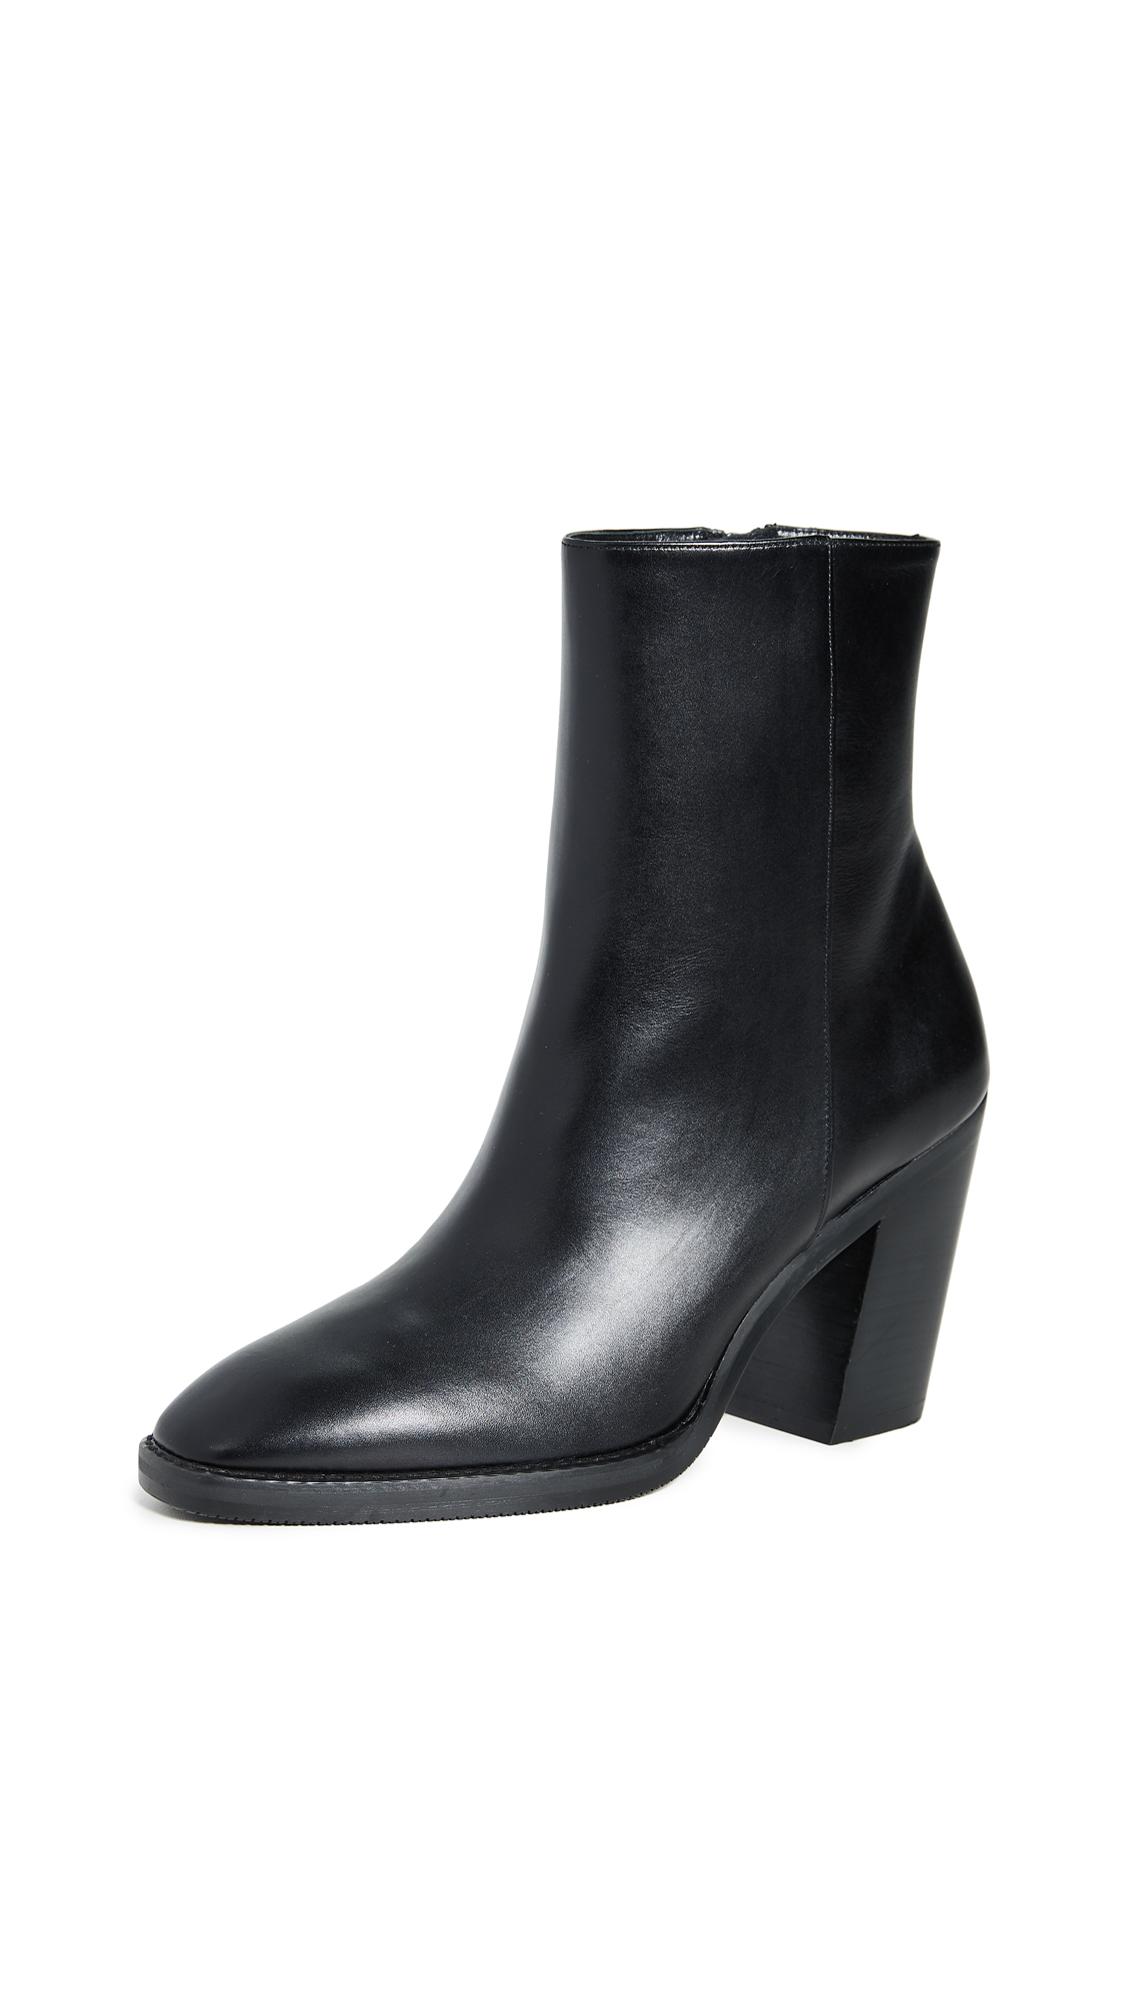 Stuart Weitzman Wynter Boots In Black